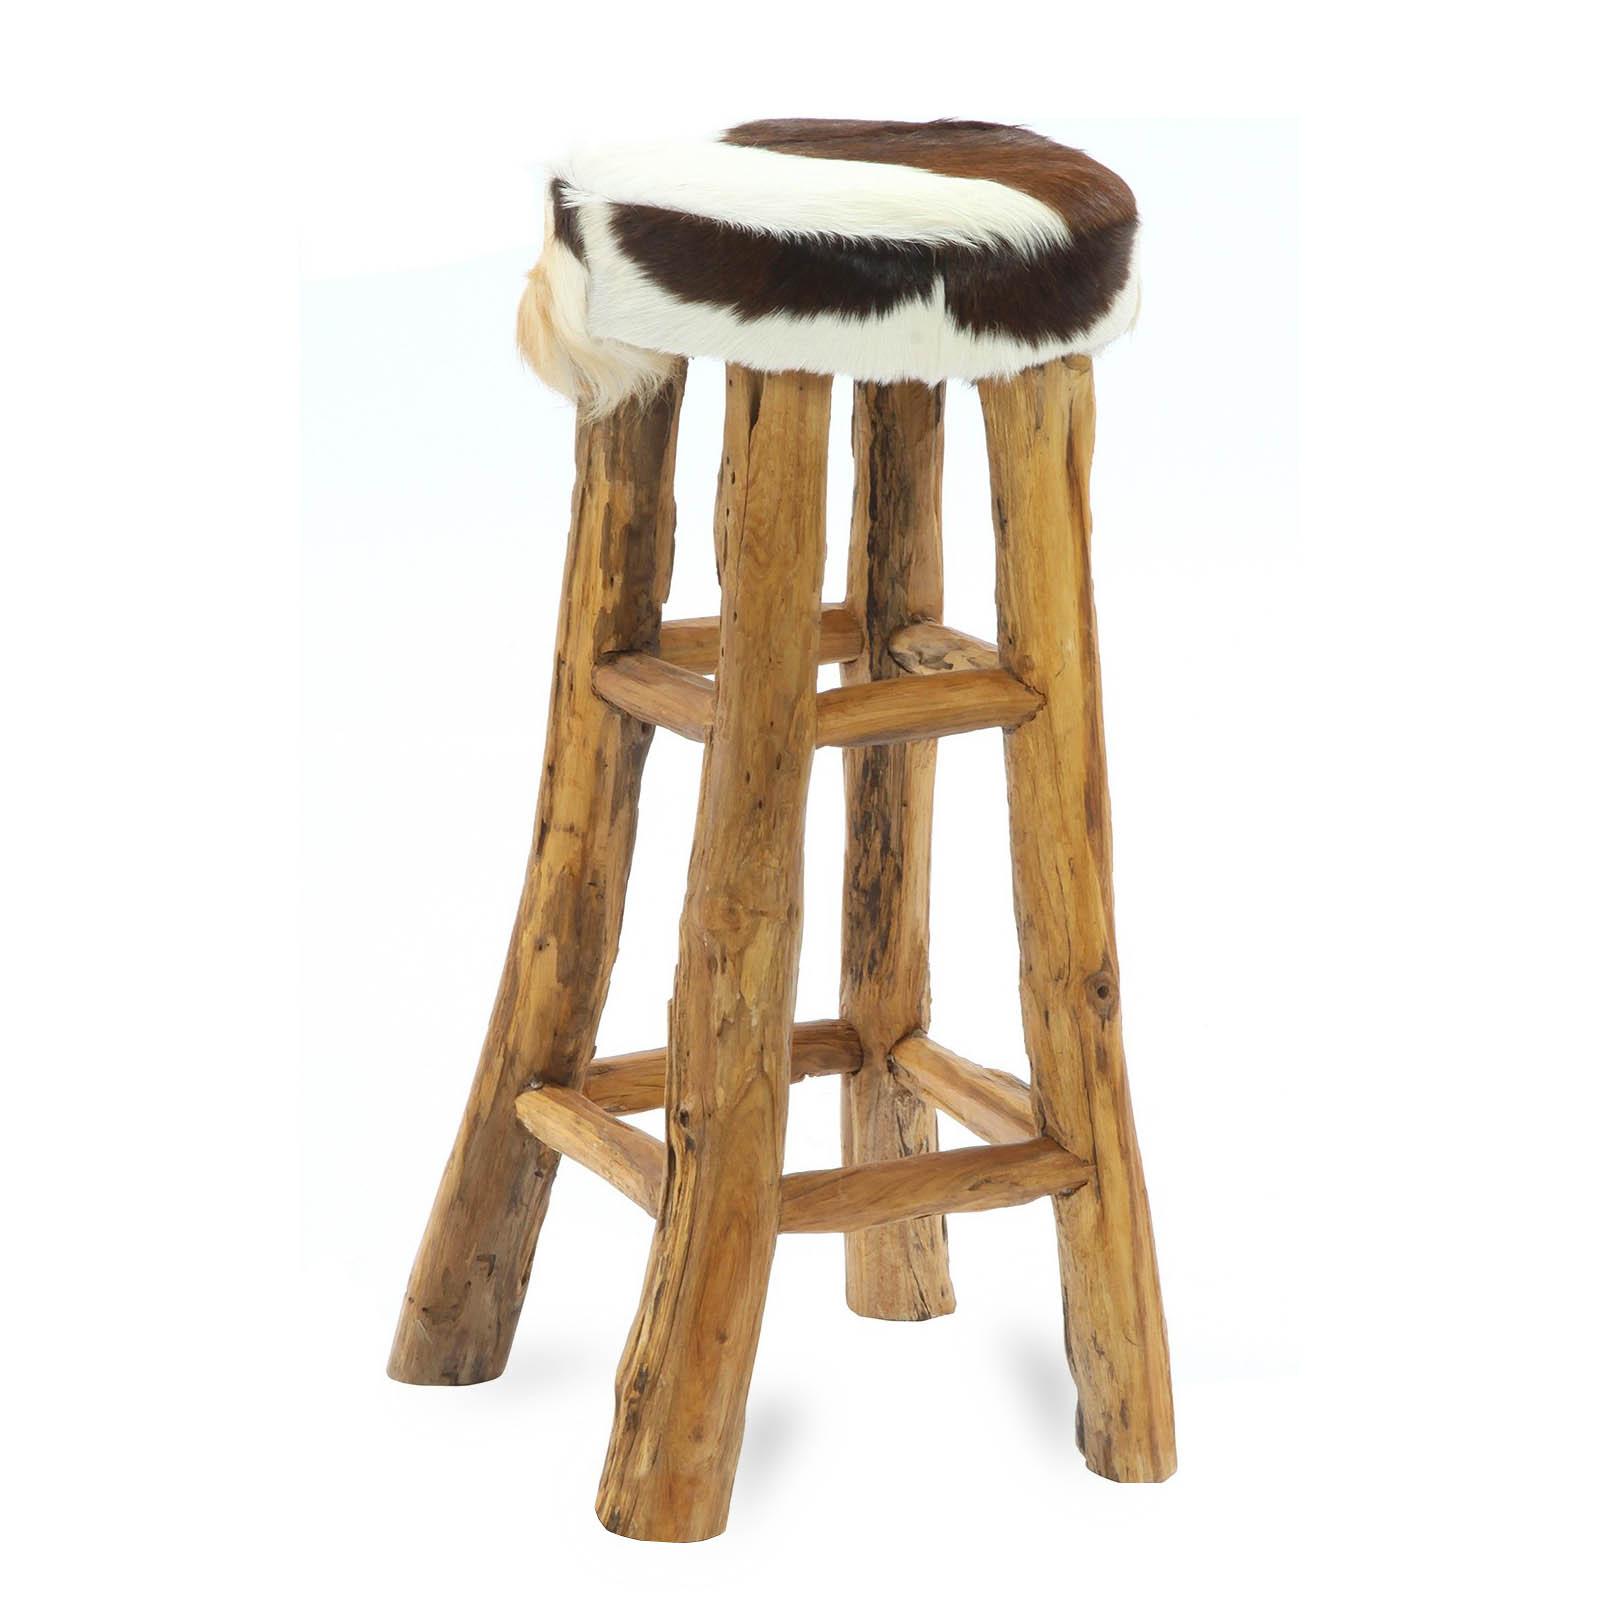 Cowhide Barstool Nat Rustic Reclaimed Teak Root And Recycled Teak Furniture Erosion Driftwood Furniture Decoration